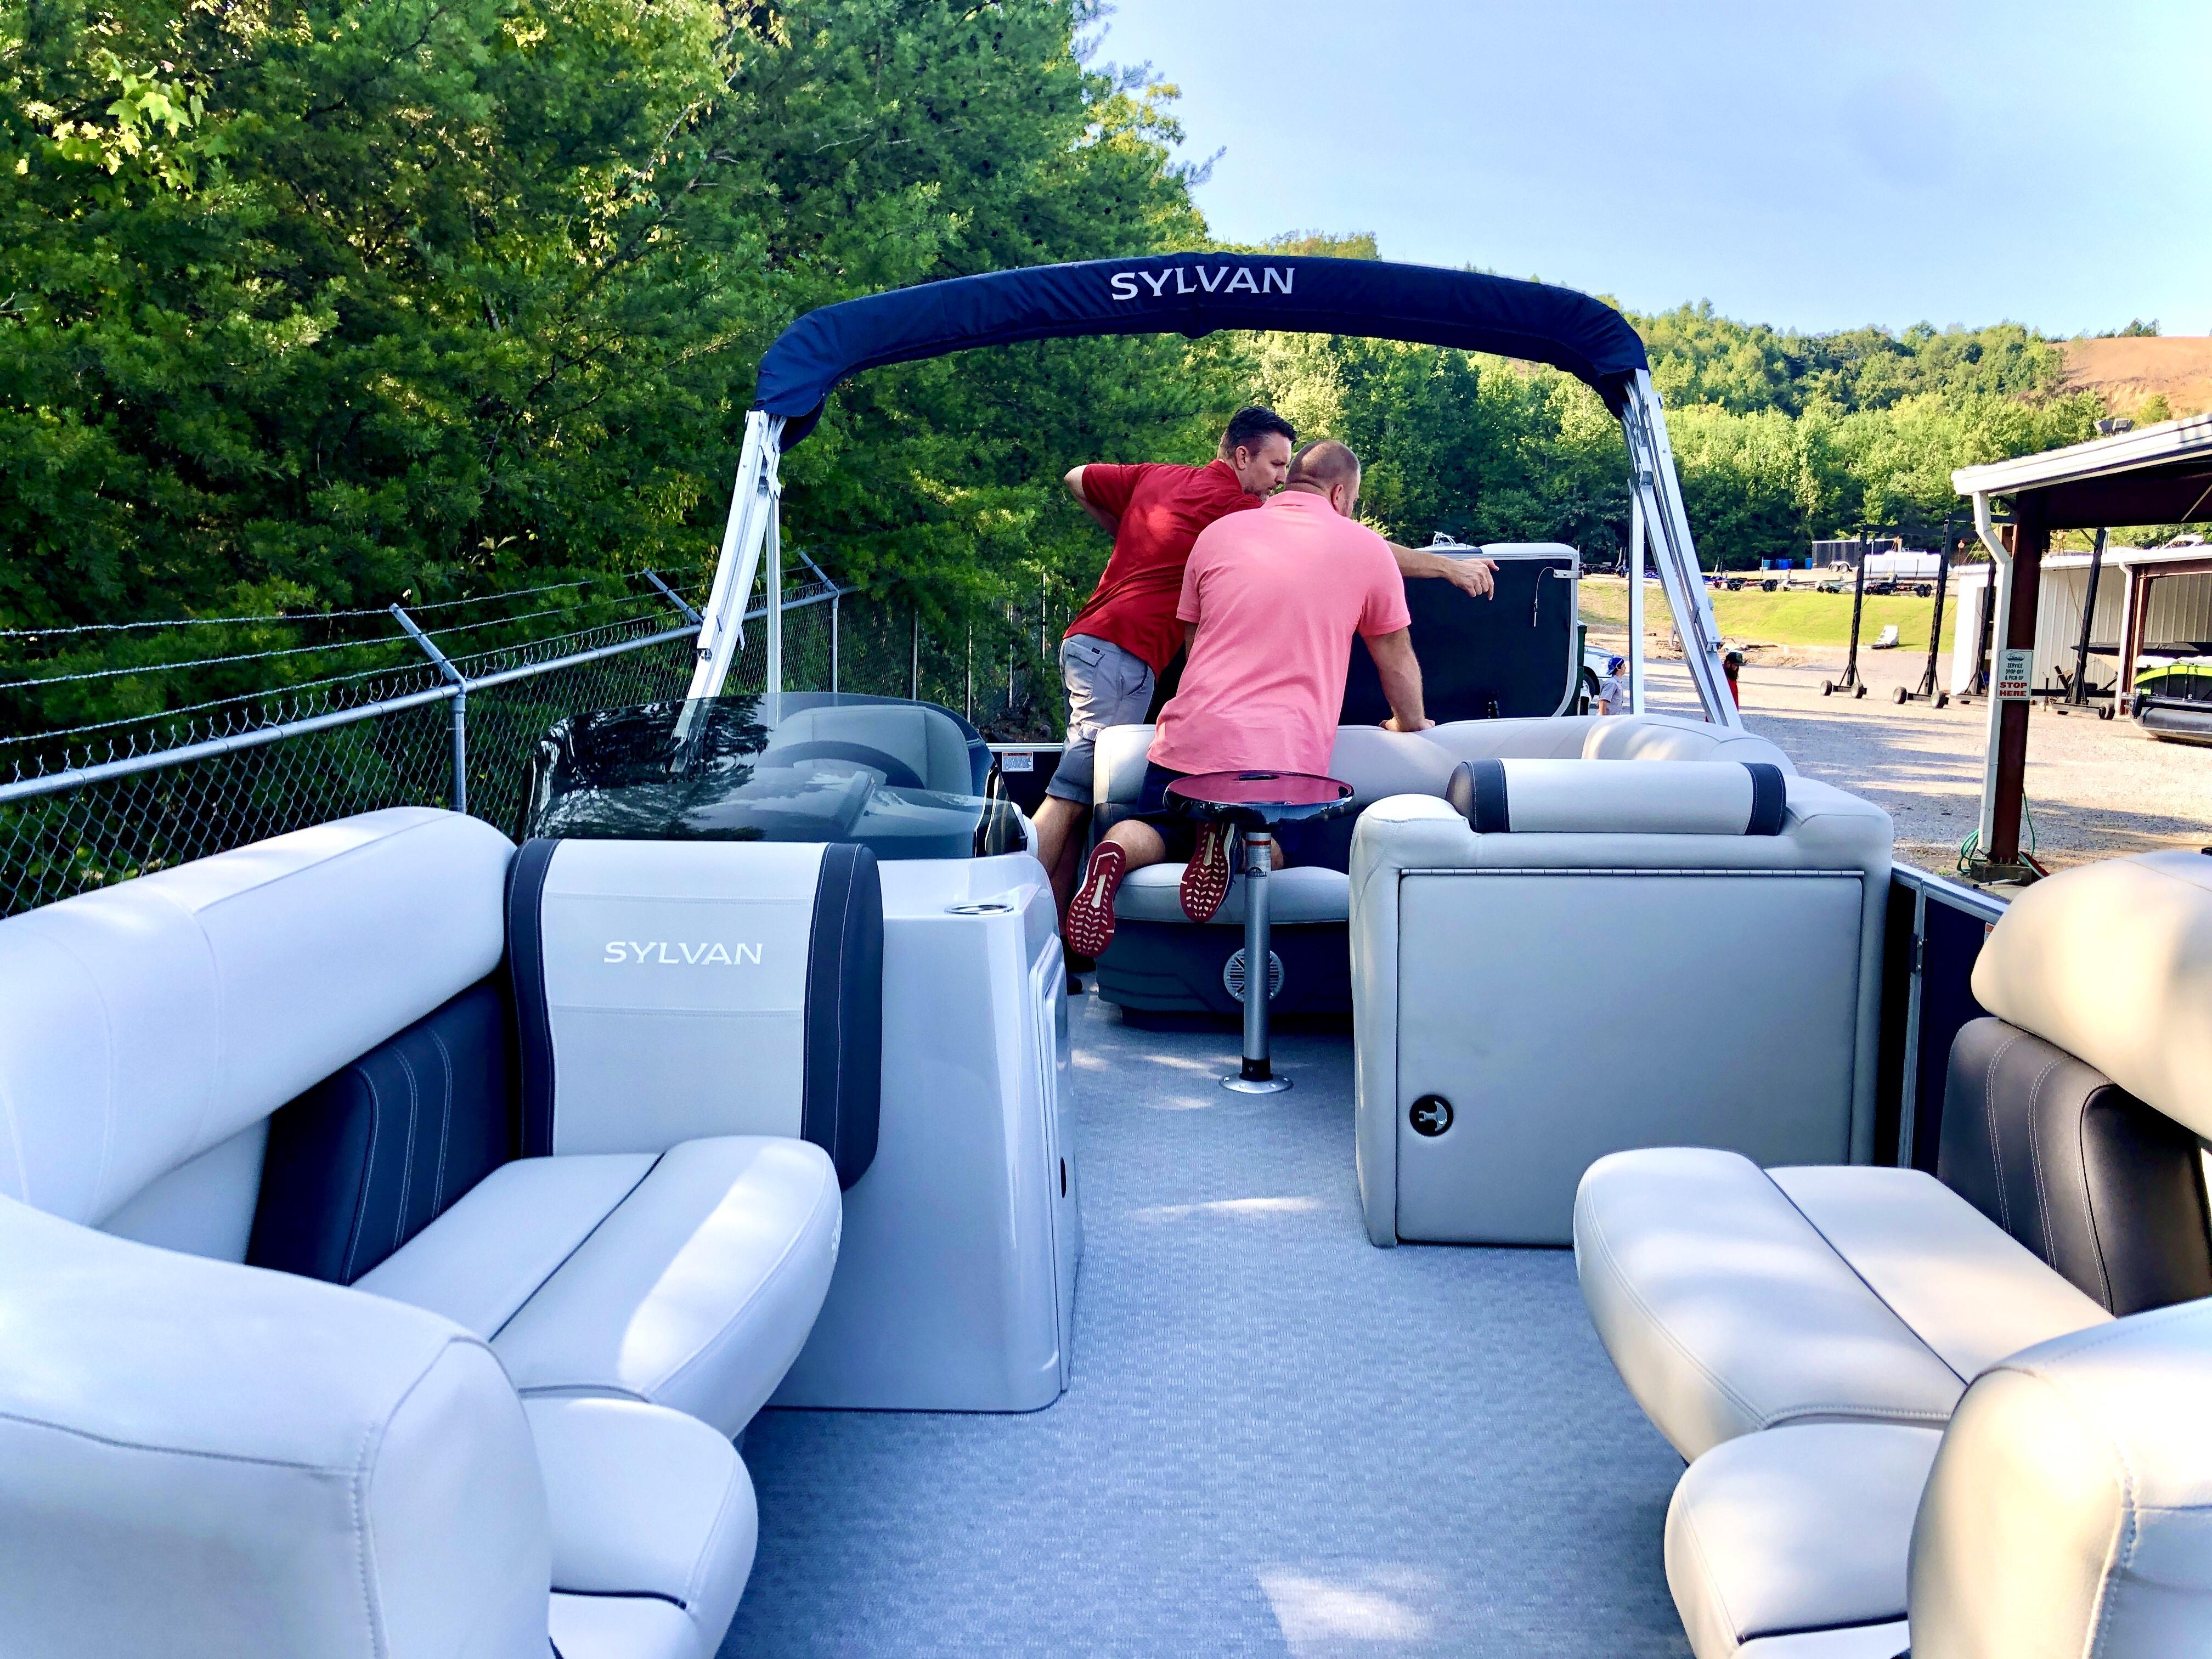 30A Boat Rental for Santa Rosa Beach Miramar Beach Destin Florida Boss Boat Rentals